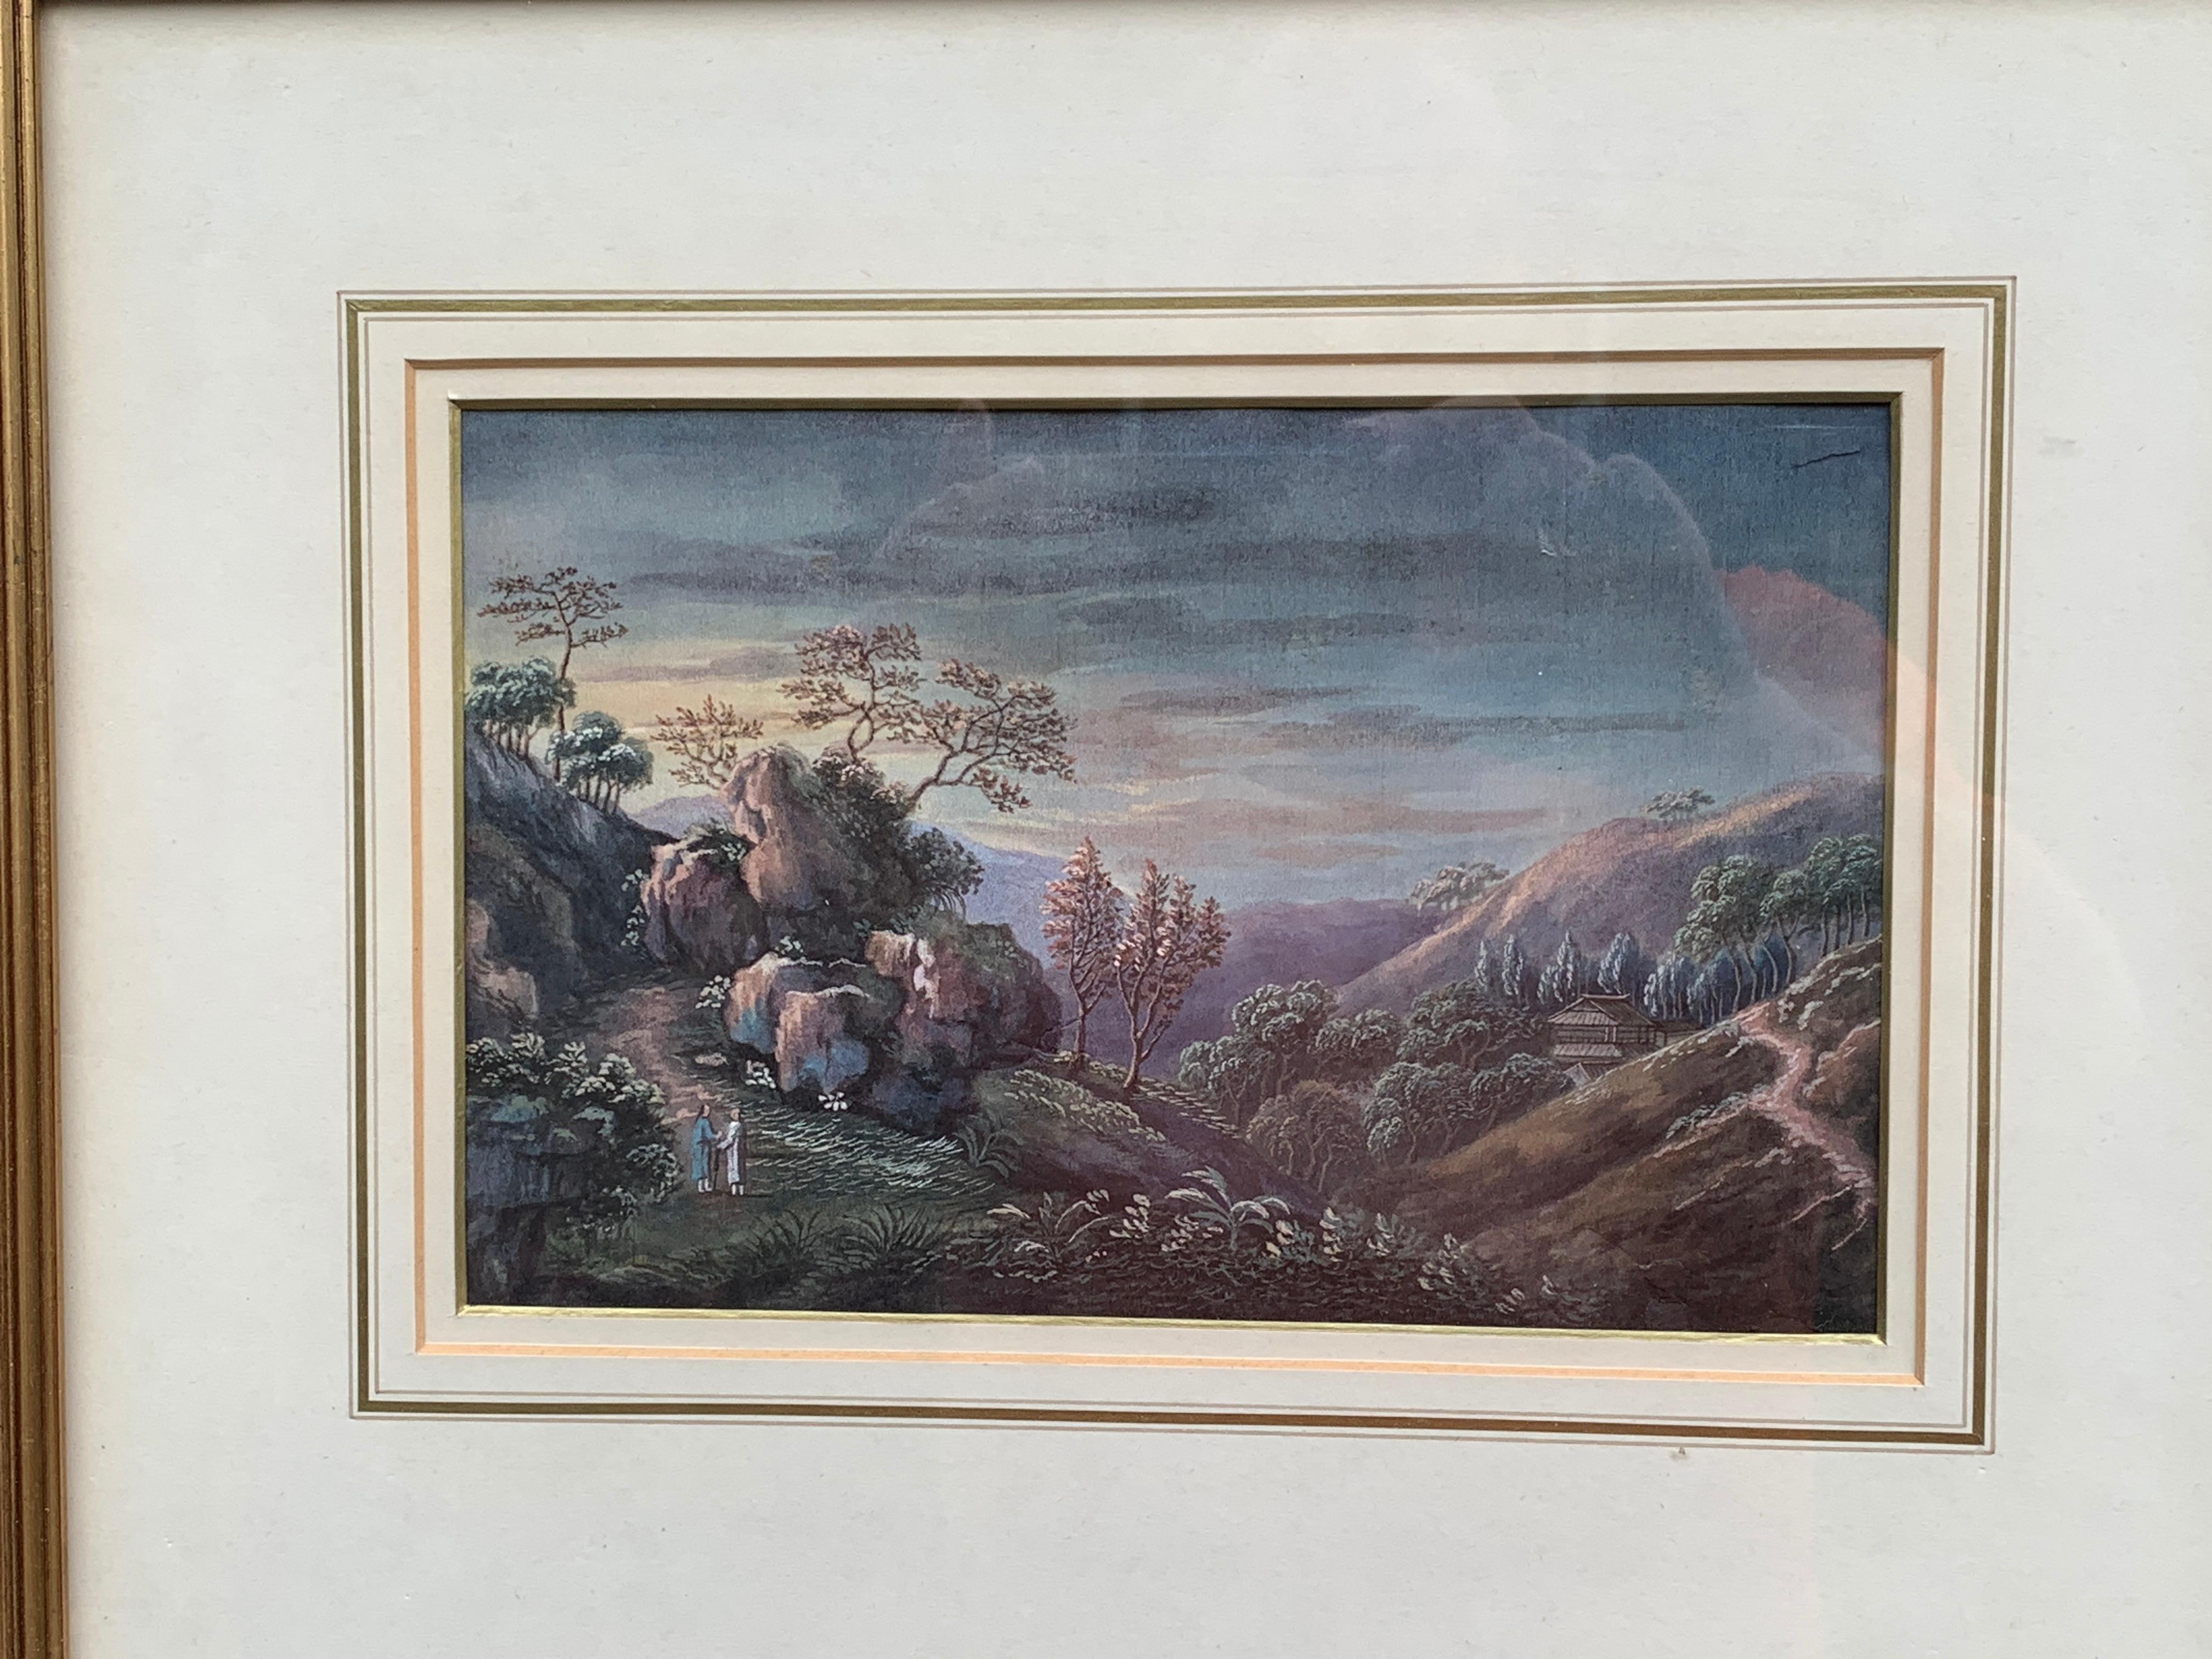 Chinese 19th century landscape